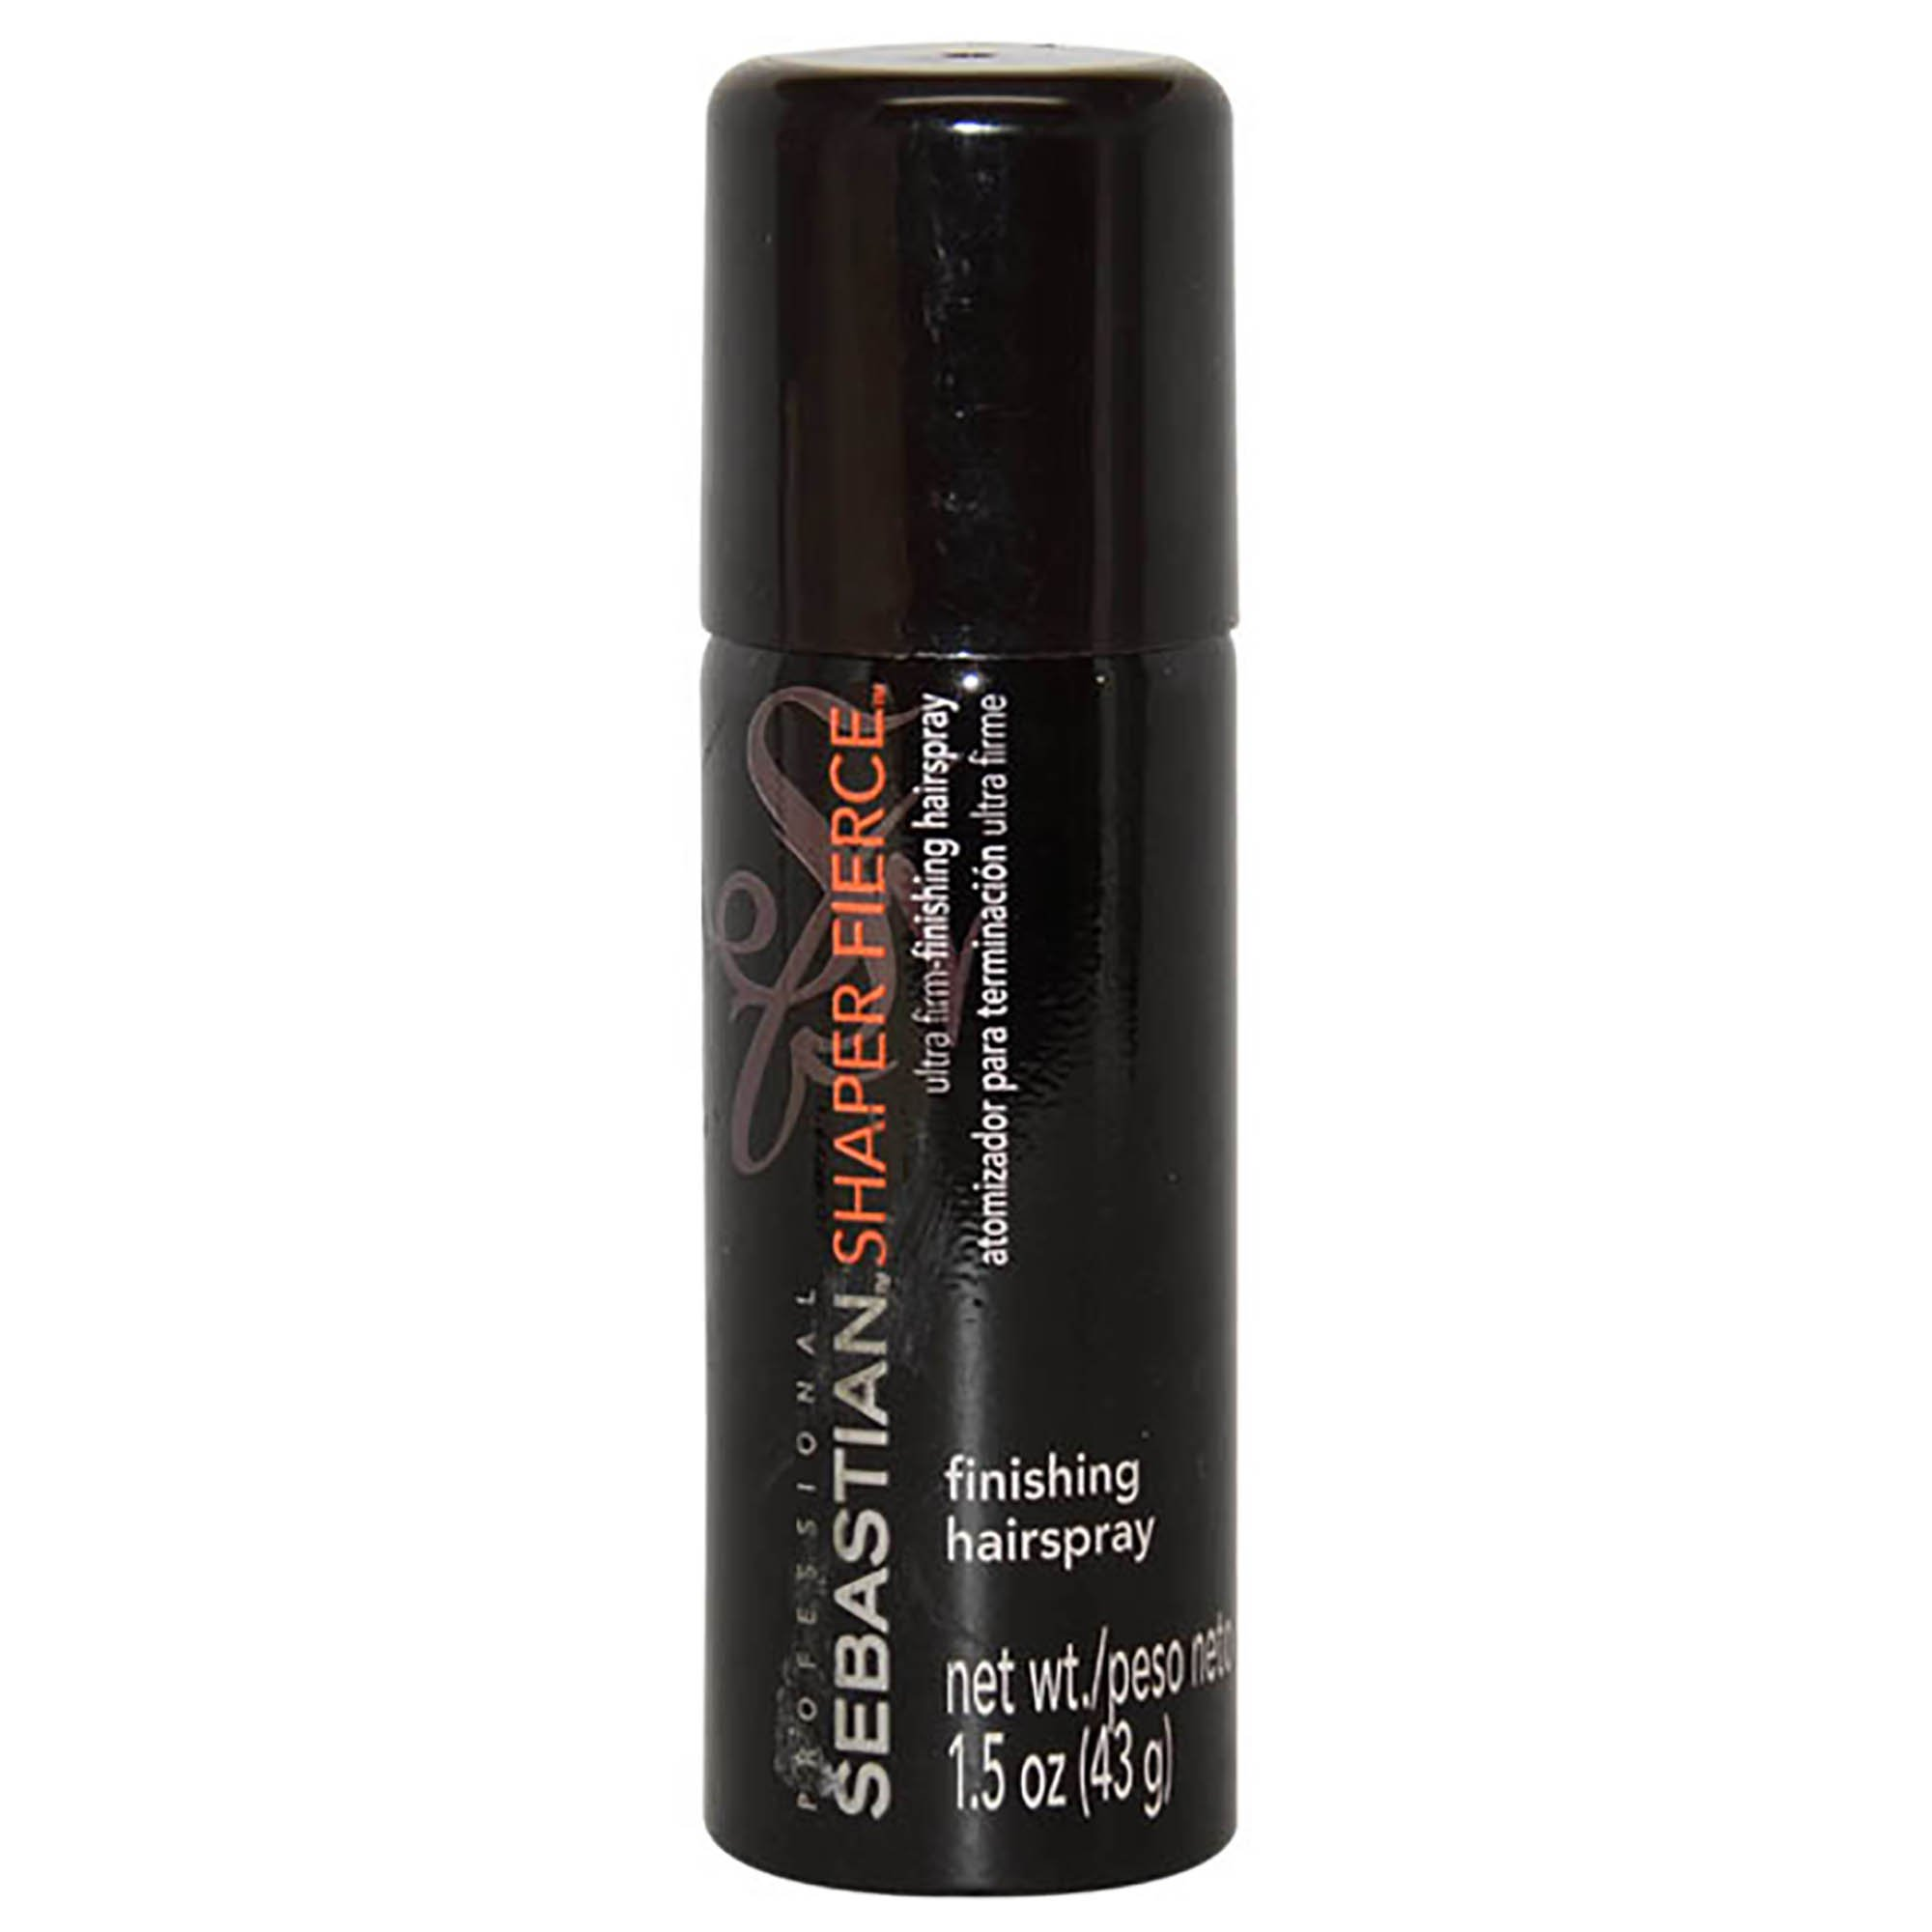 Sebastian Professional Shaper Fierce Hair Spray, 1.5 Ounce